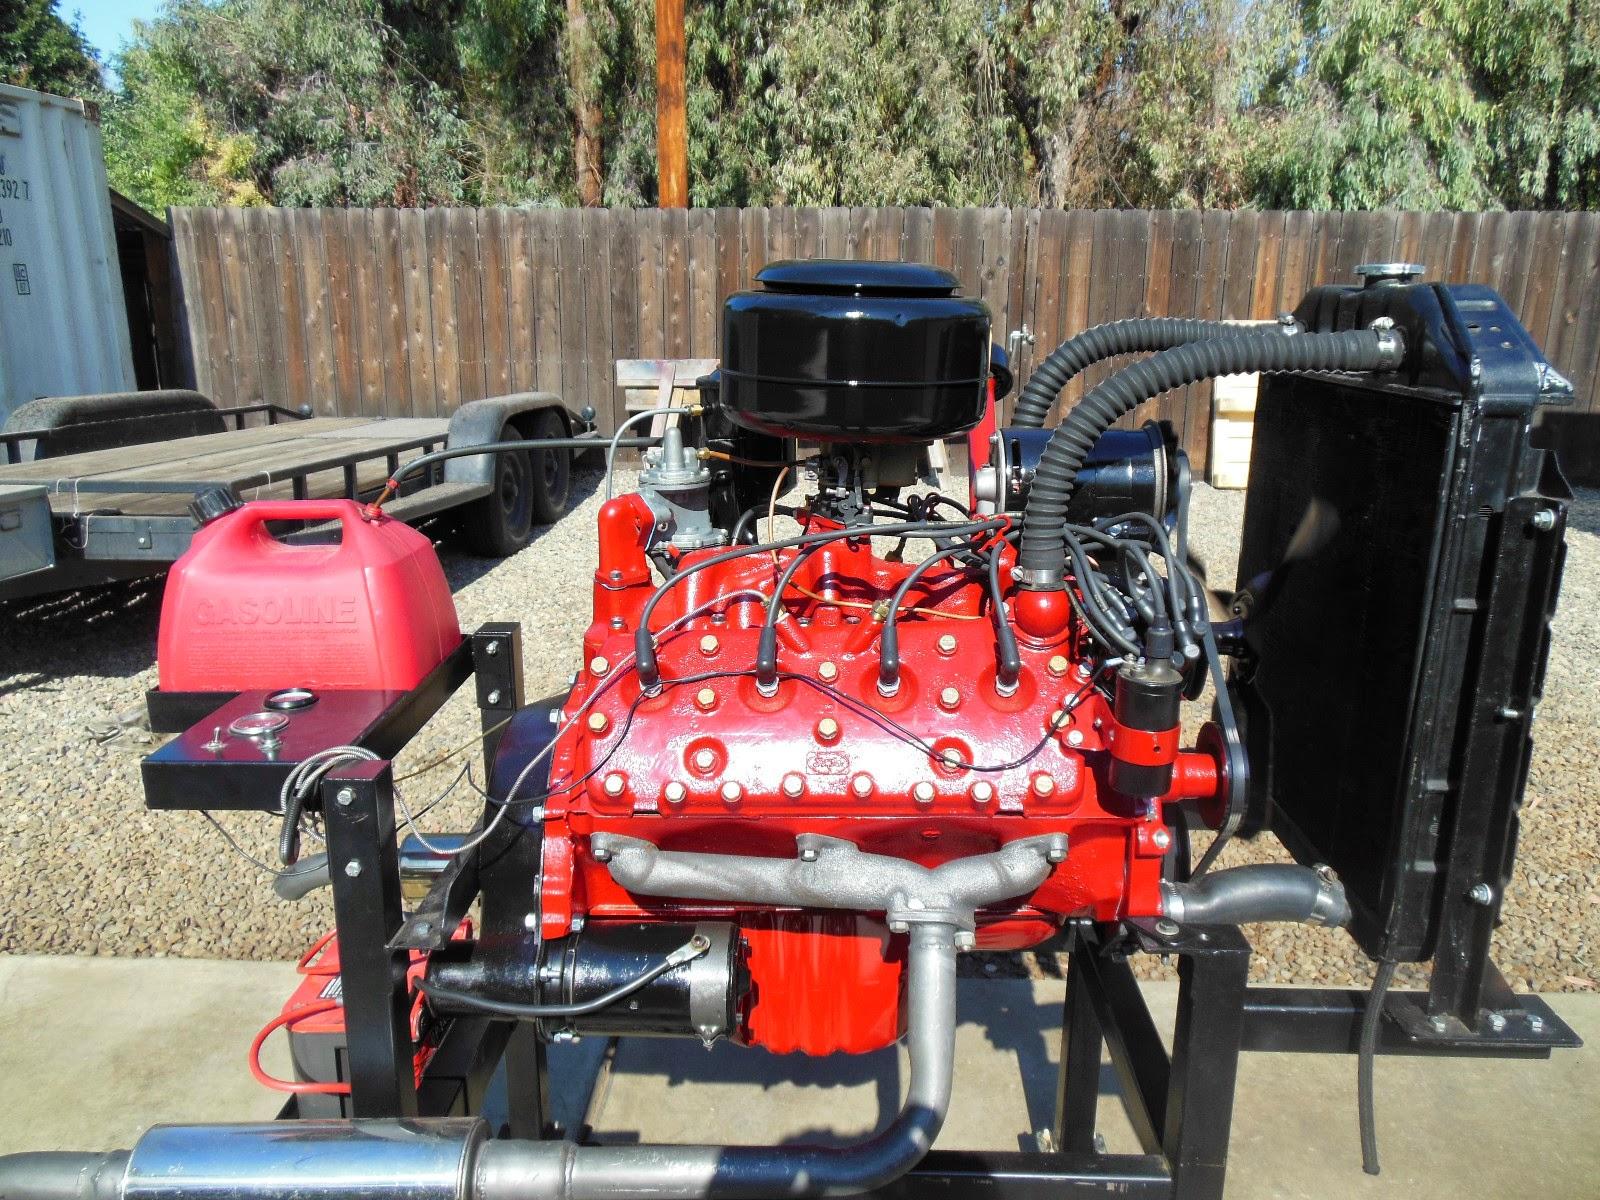 medium resolution of flathead ford engines internal diagrams wiring diagram flathead ford engines internal diagrams